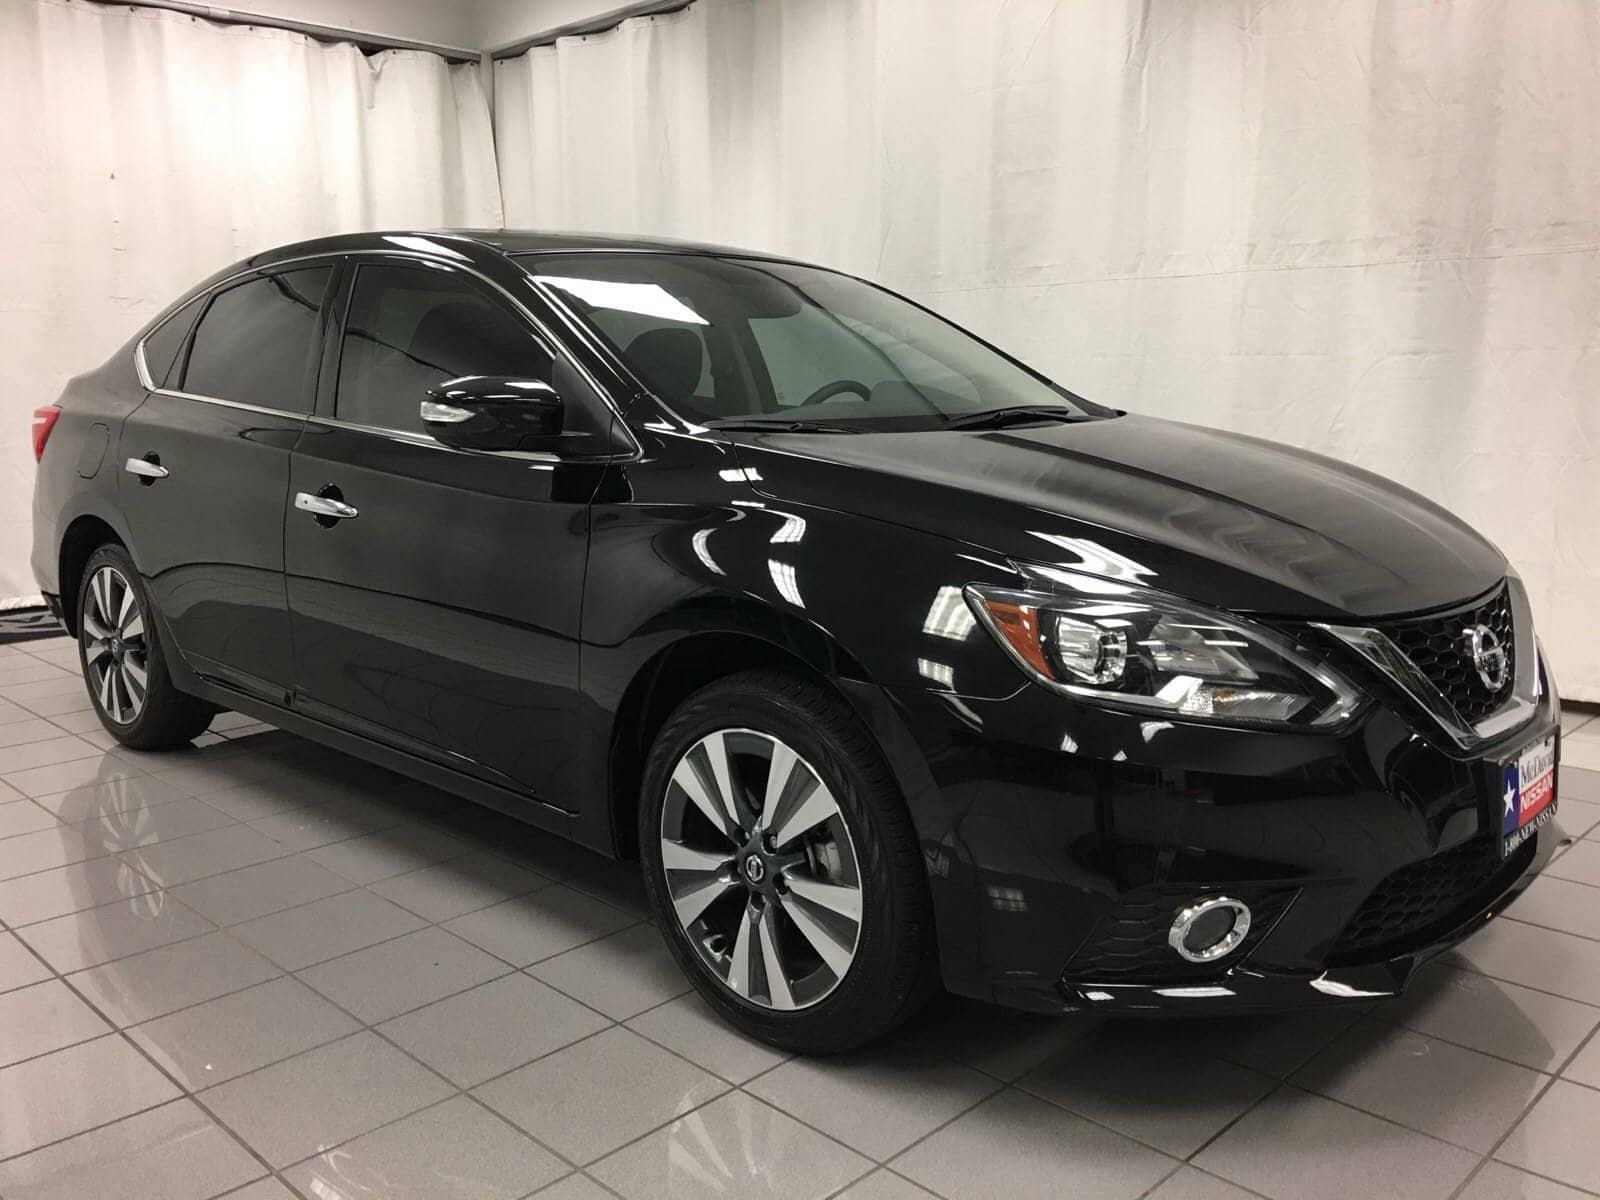 Photo Used 2018 Nissan Sentra For Sale at David McDavid Nissan  VIN 3N1AB7AP7JY238375